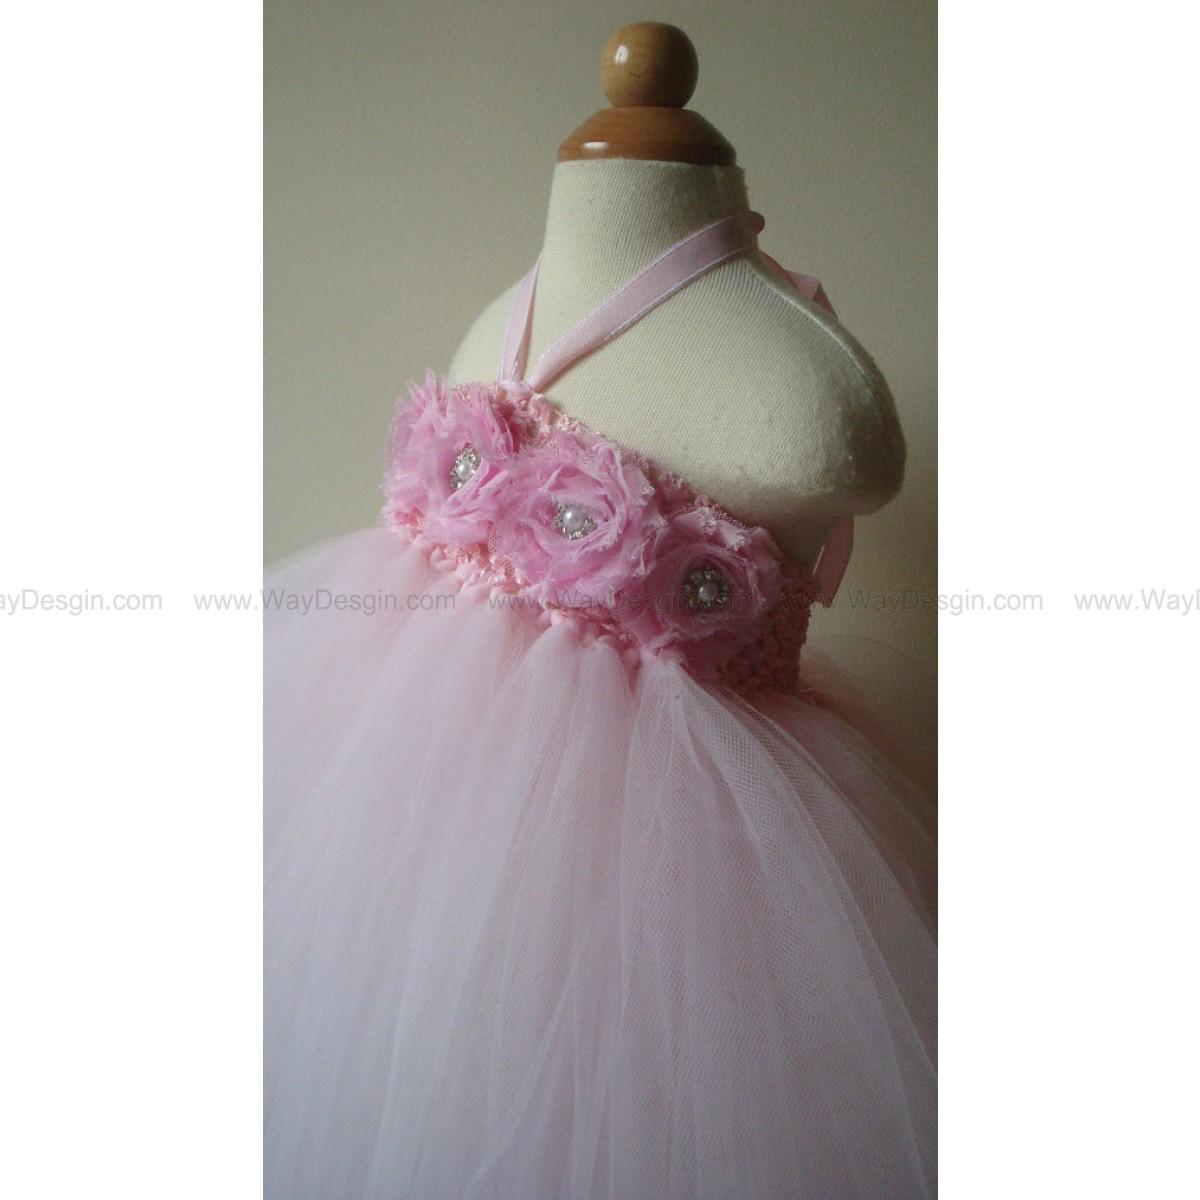 Flower girl dress, light pink tutu dress, roses, baby tutu dress, toddler tutu dress, newborn